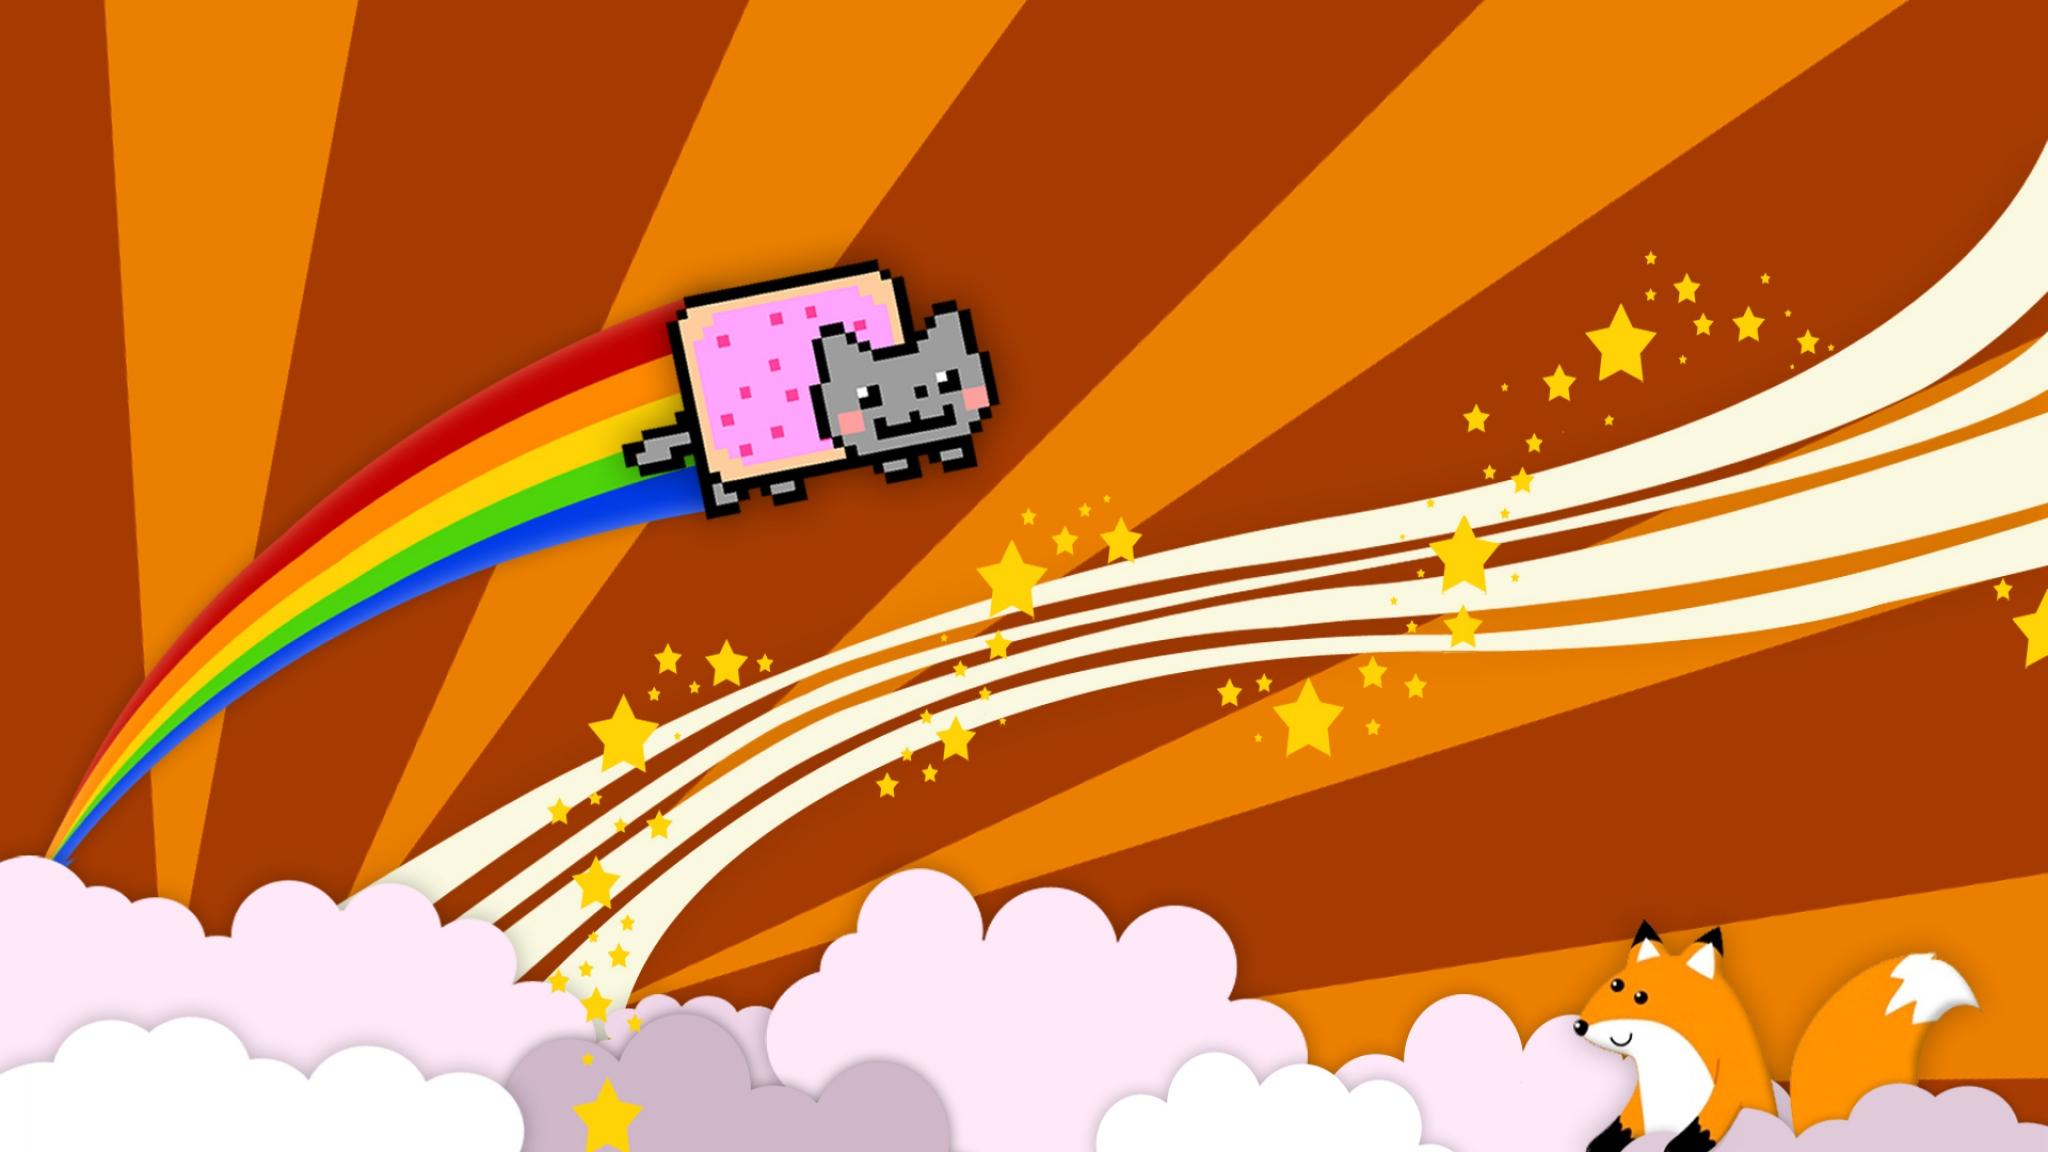 HD Nyan cat Wallpapers HD, Desktop Backgrounds 2048x1152, Images